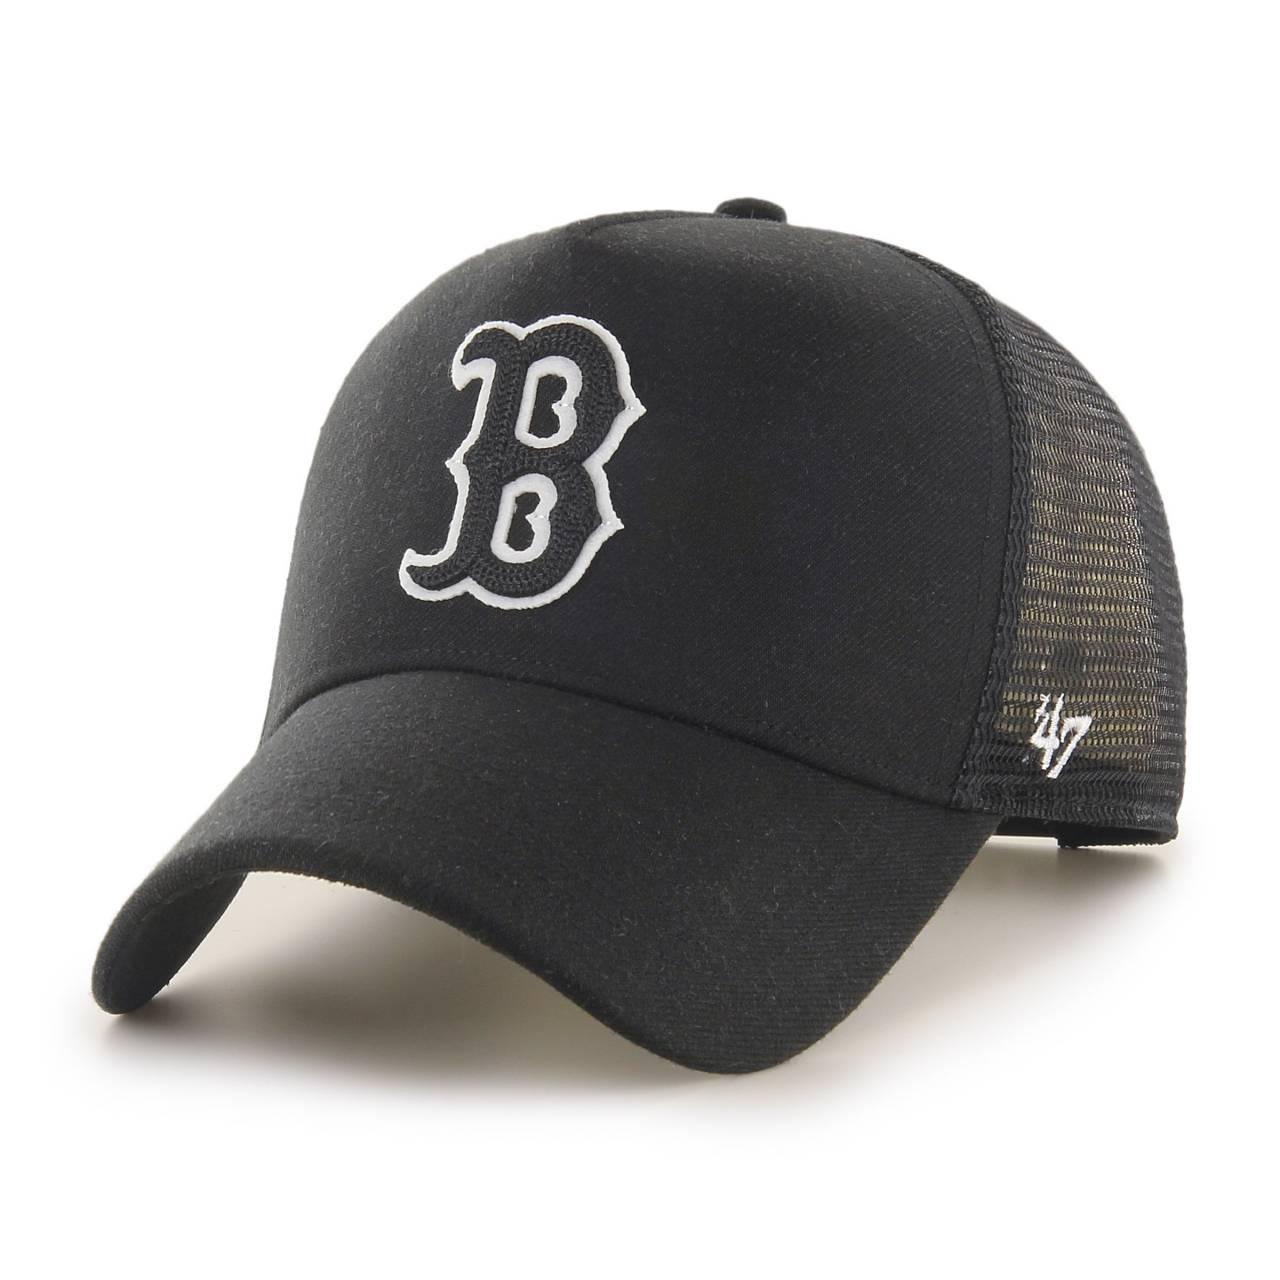 B-CHLMM02WBP-BK-mlb-boston-red-sox-trucker-black-47